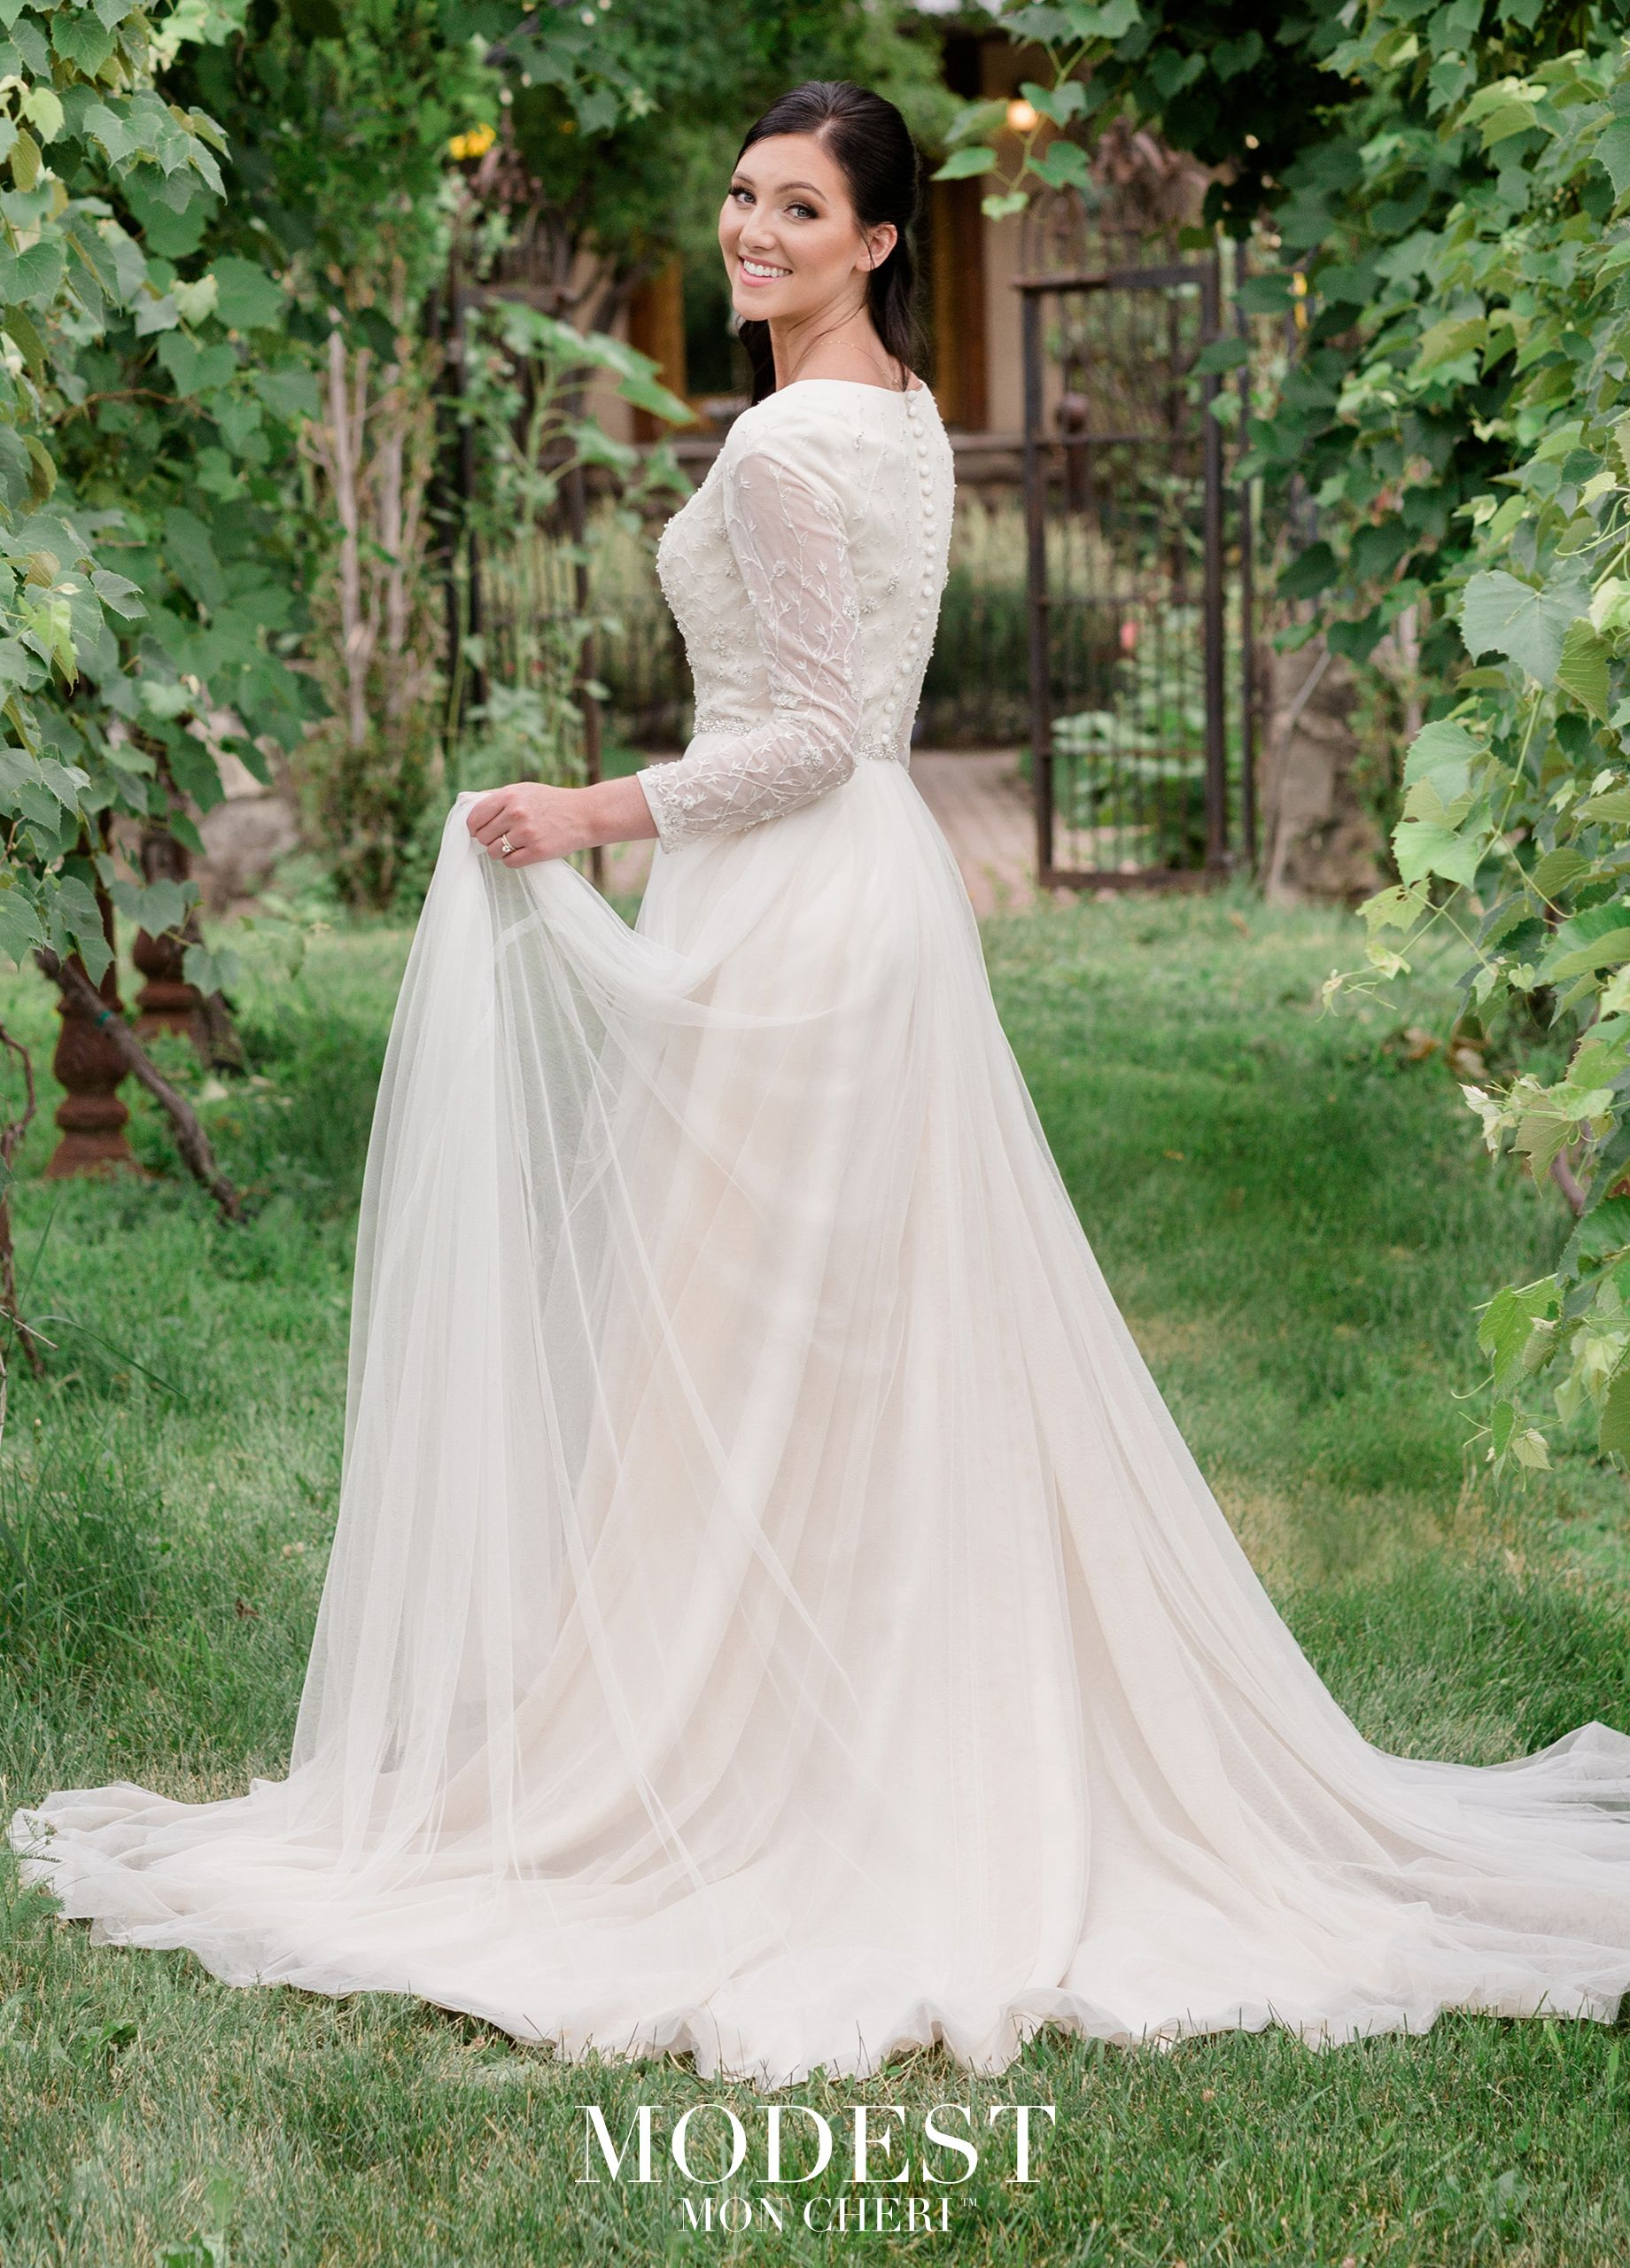 Modest Wedding Dresses TR11973 - English net A-line gown features curved V  neckline ecf2a12de